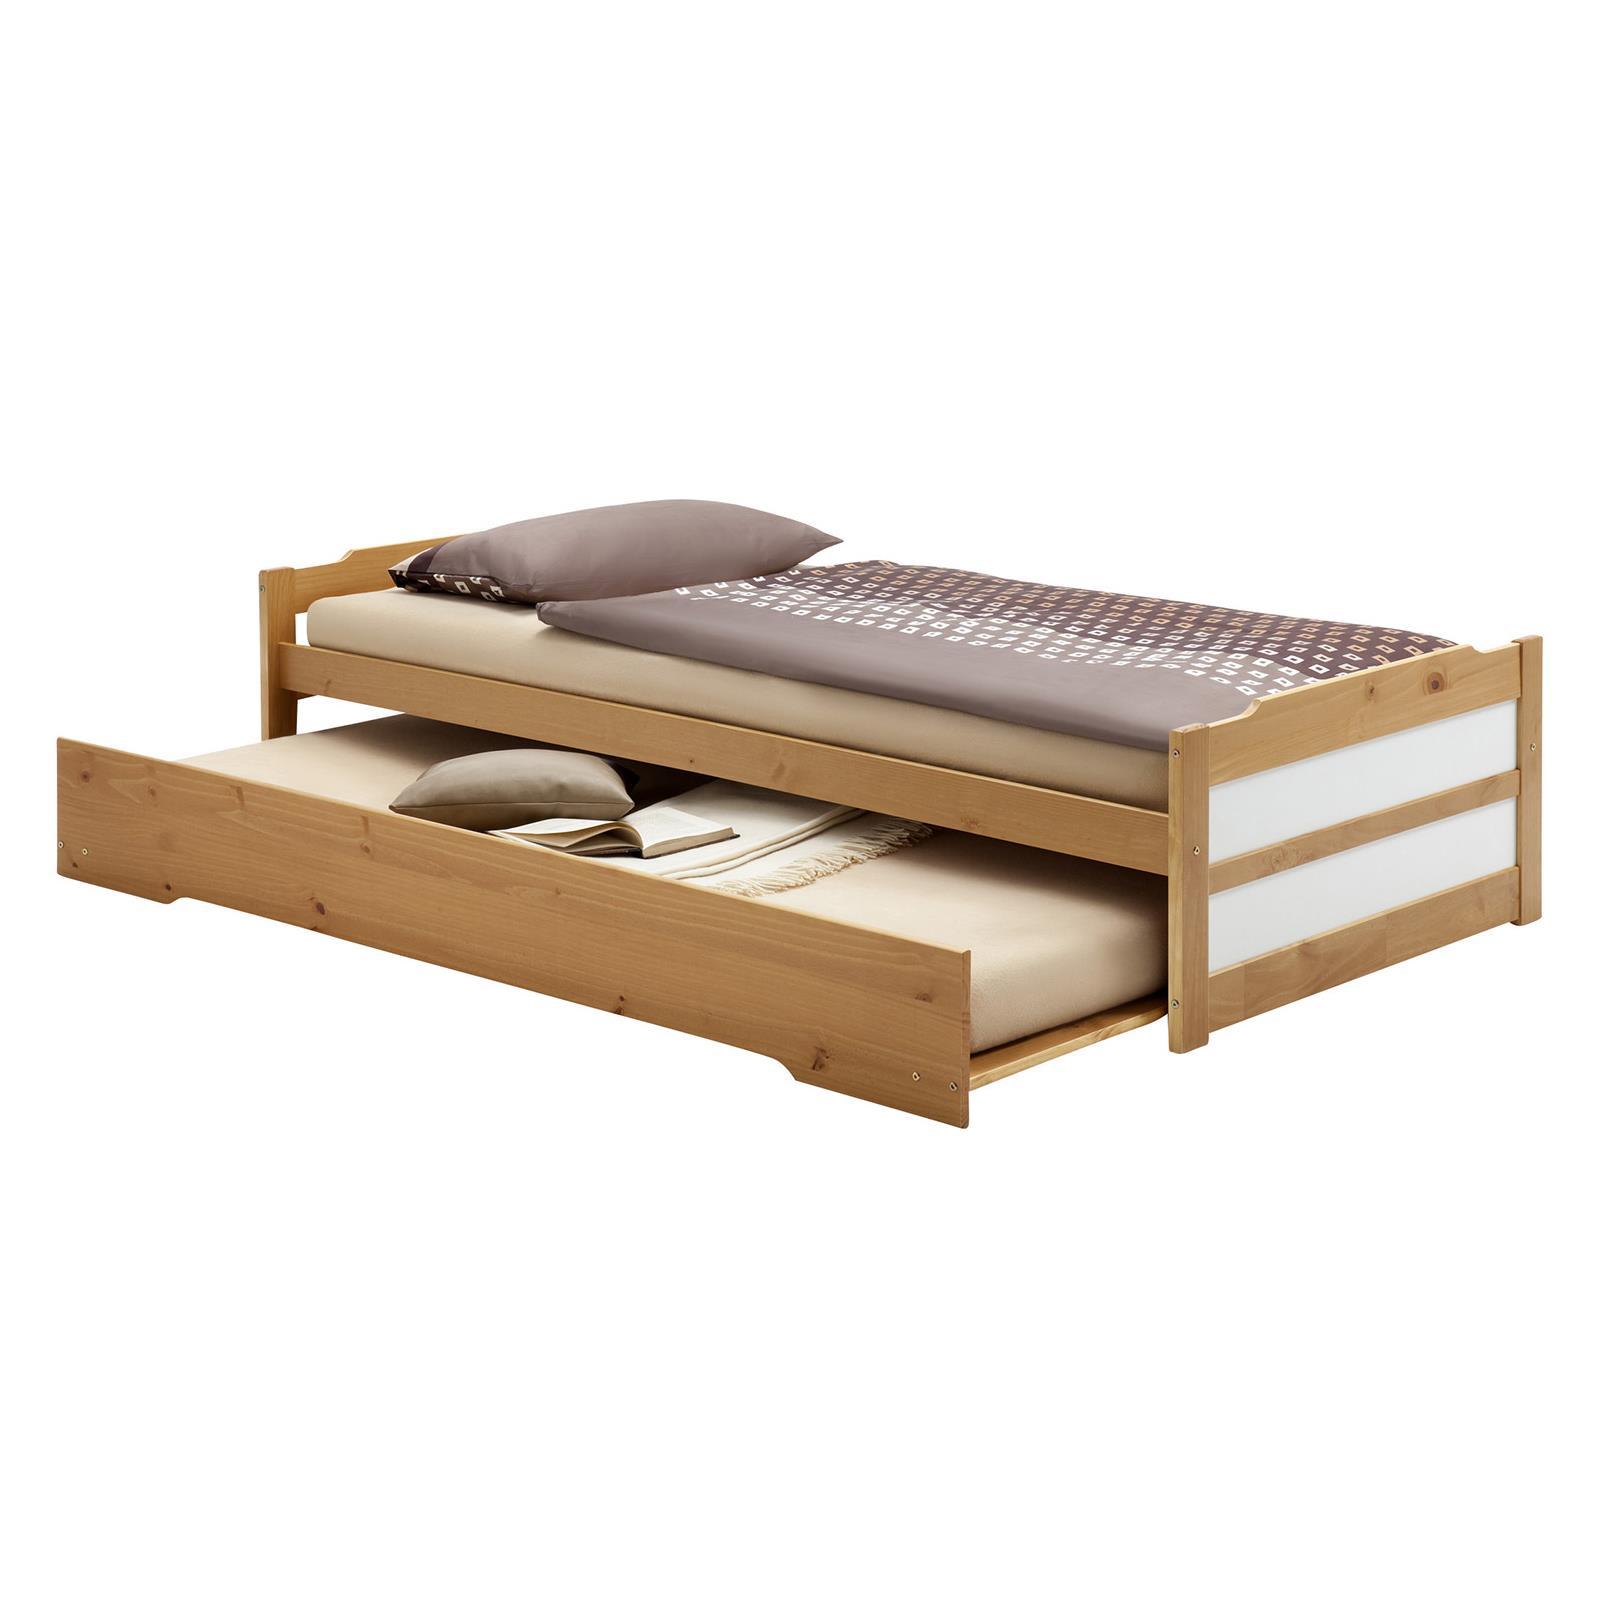 tandembett funktionsbett kojenbett auszugsbett schubladenbett kiefer farbauswahl ebay. Black Bedroom Furniture Sets. Home Design Ideas